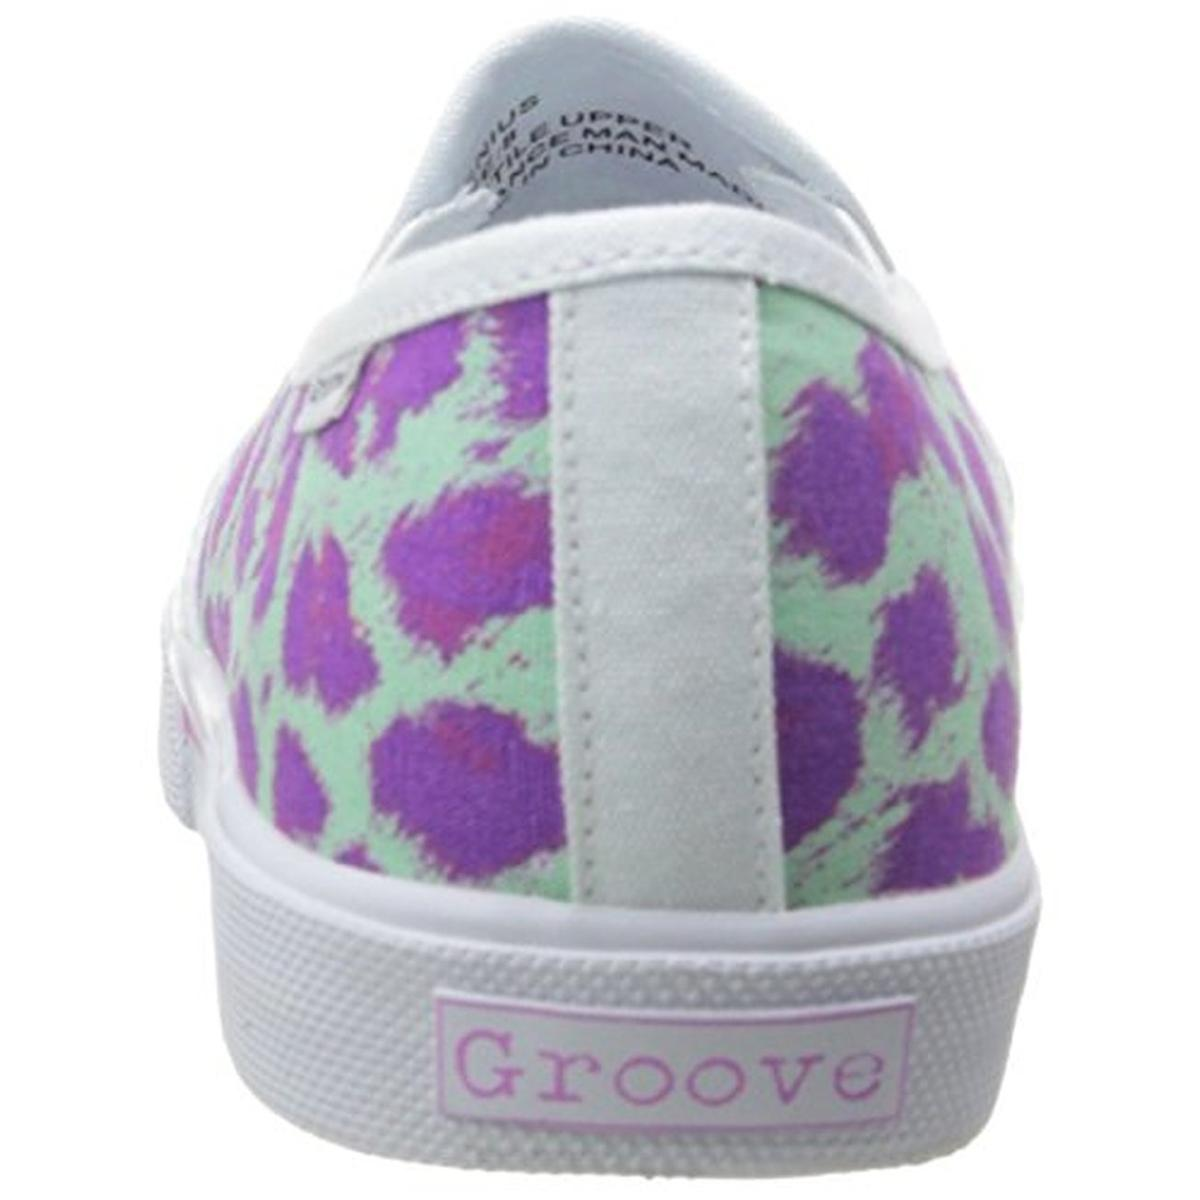 Groove Femme Genius Toile Enfiler Fashion Baskets Chaussures BHFO 3258